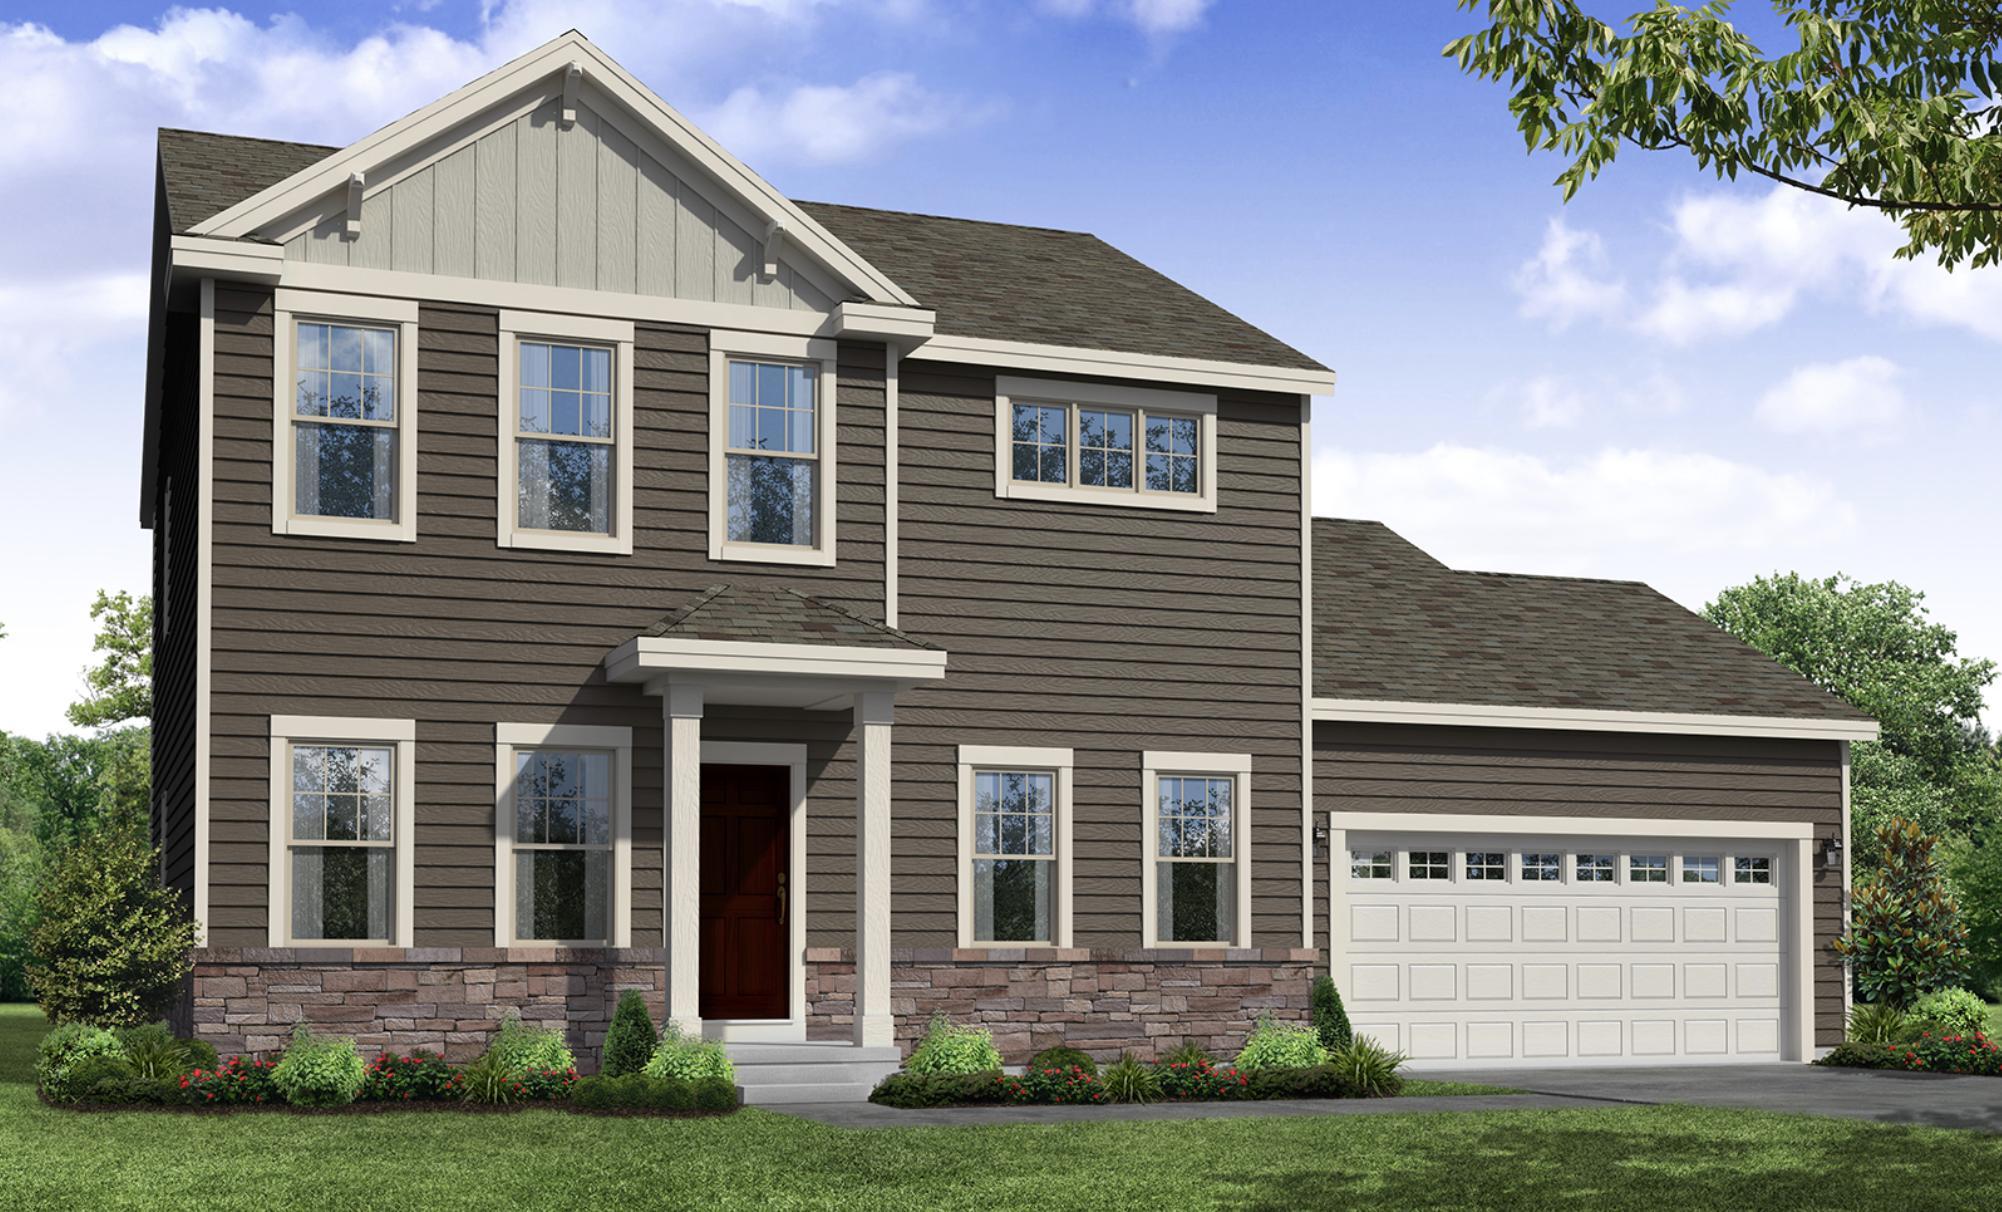 1270 Juniper Ln, Oconomowoc, Wisconsin 53066, 4 Bedrooms Bedrooms, ,2 BathroomsBathrooms,Single-Family,For Sale,Juniper Ln,1644408